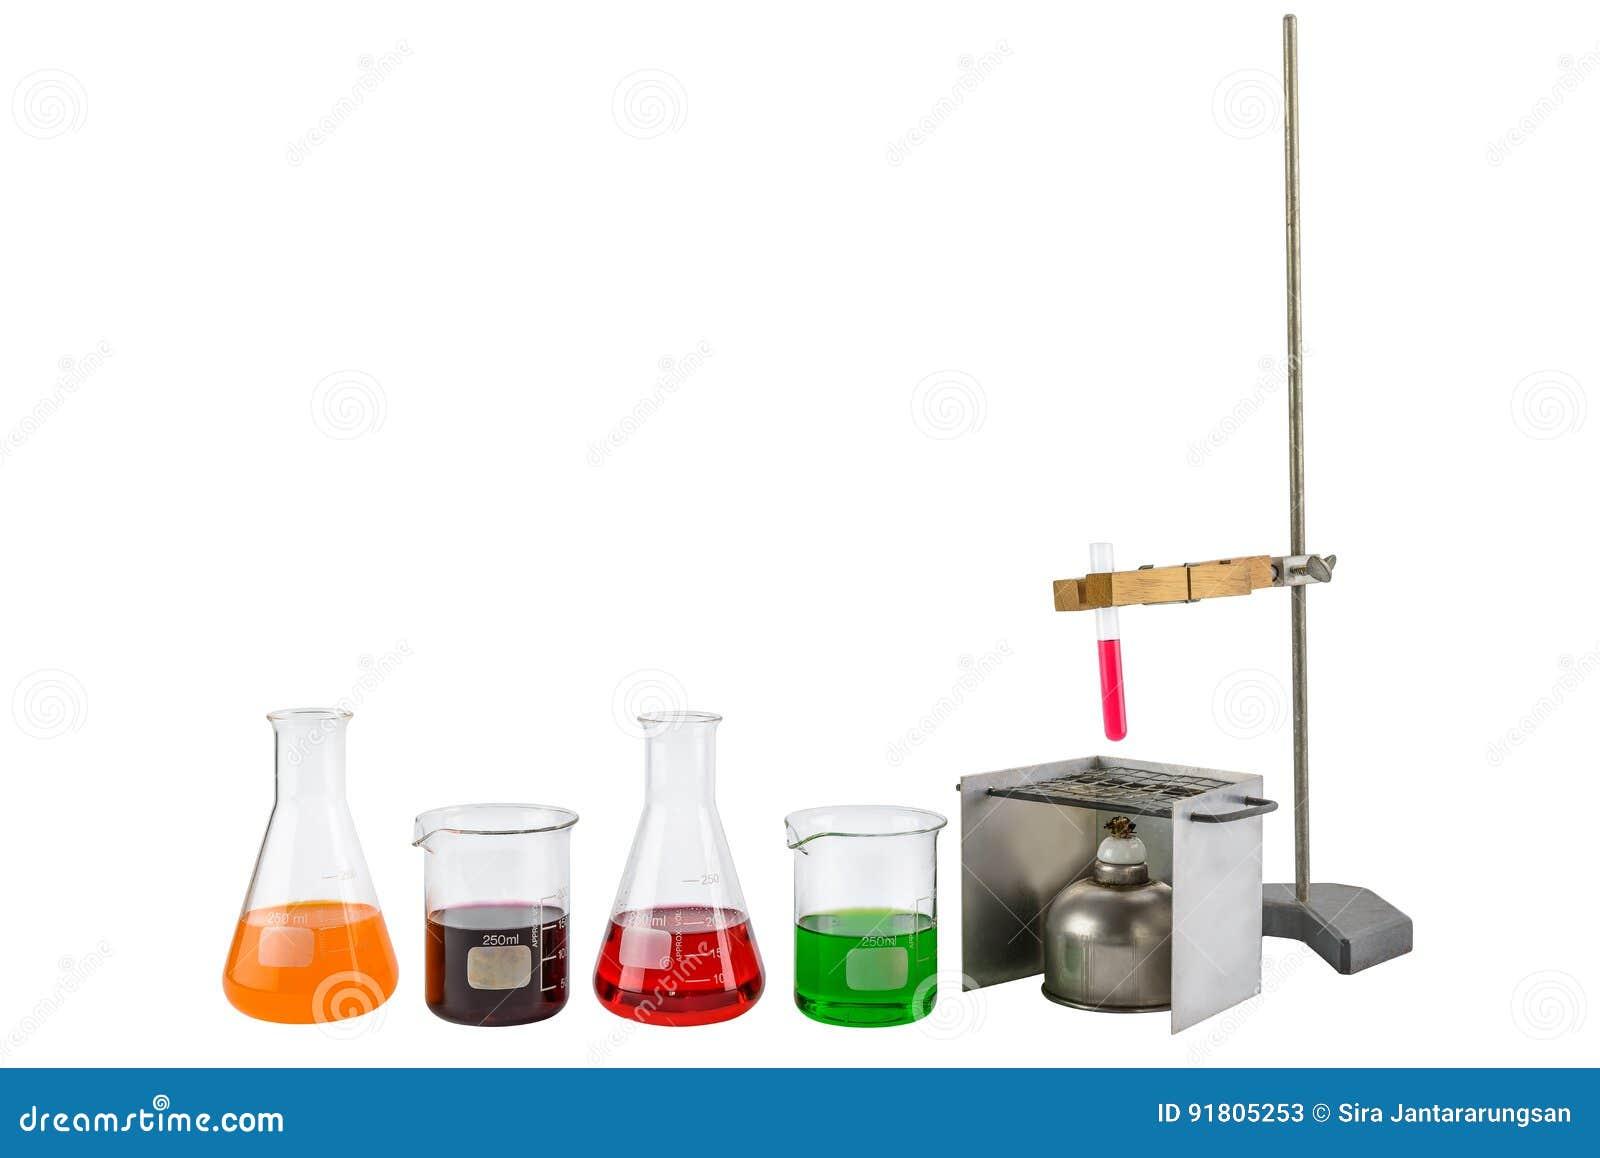 Laboratory Equipment Test Tube Holder And Alcohol Lamp, Test Tub ... for Laboratory Test Tube Holder  15lptgx